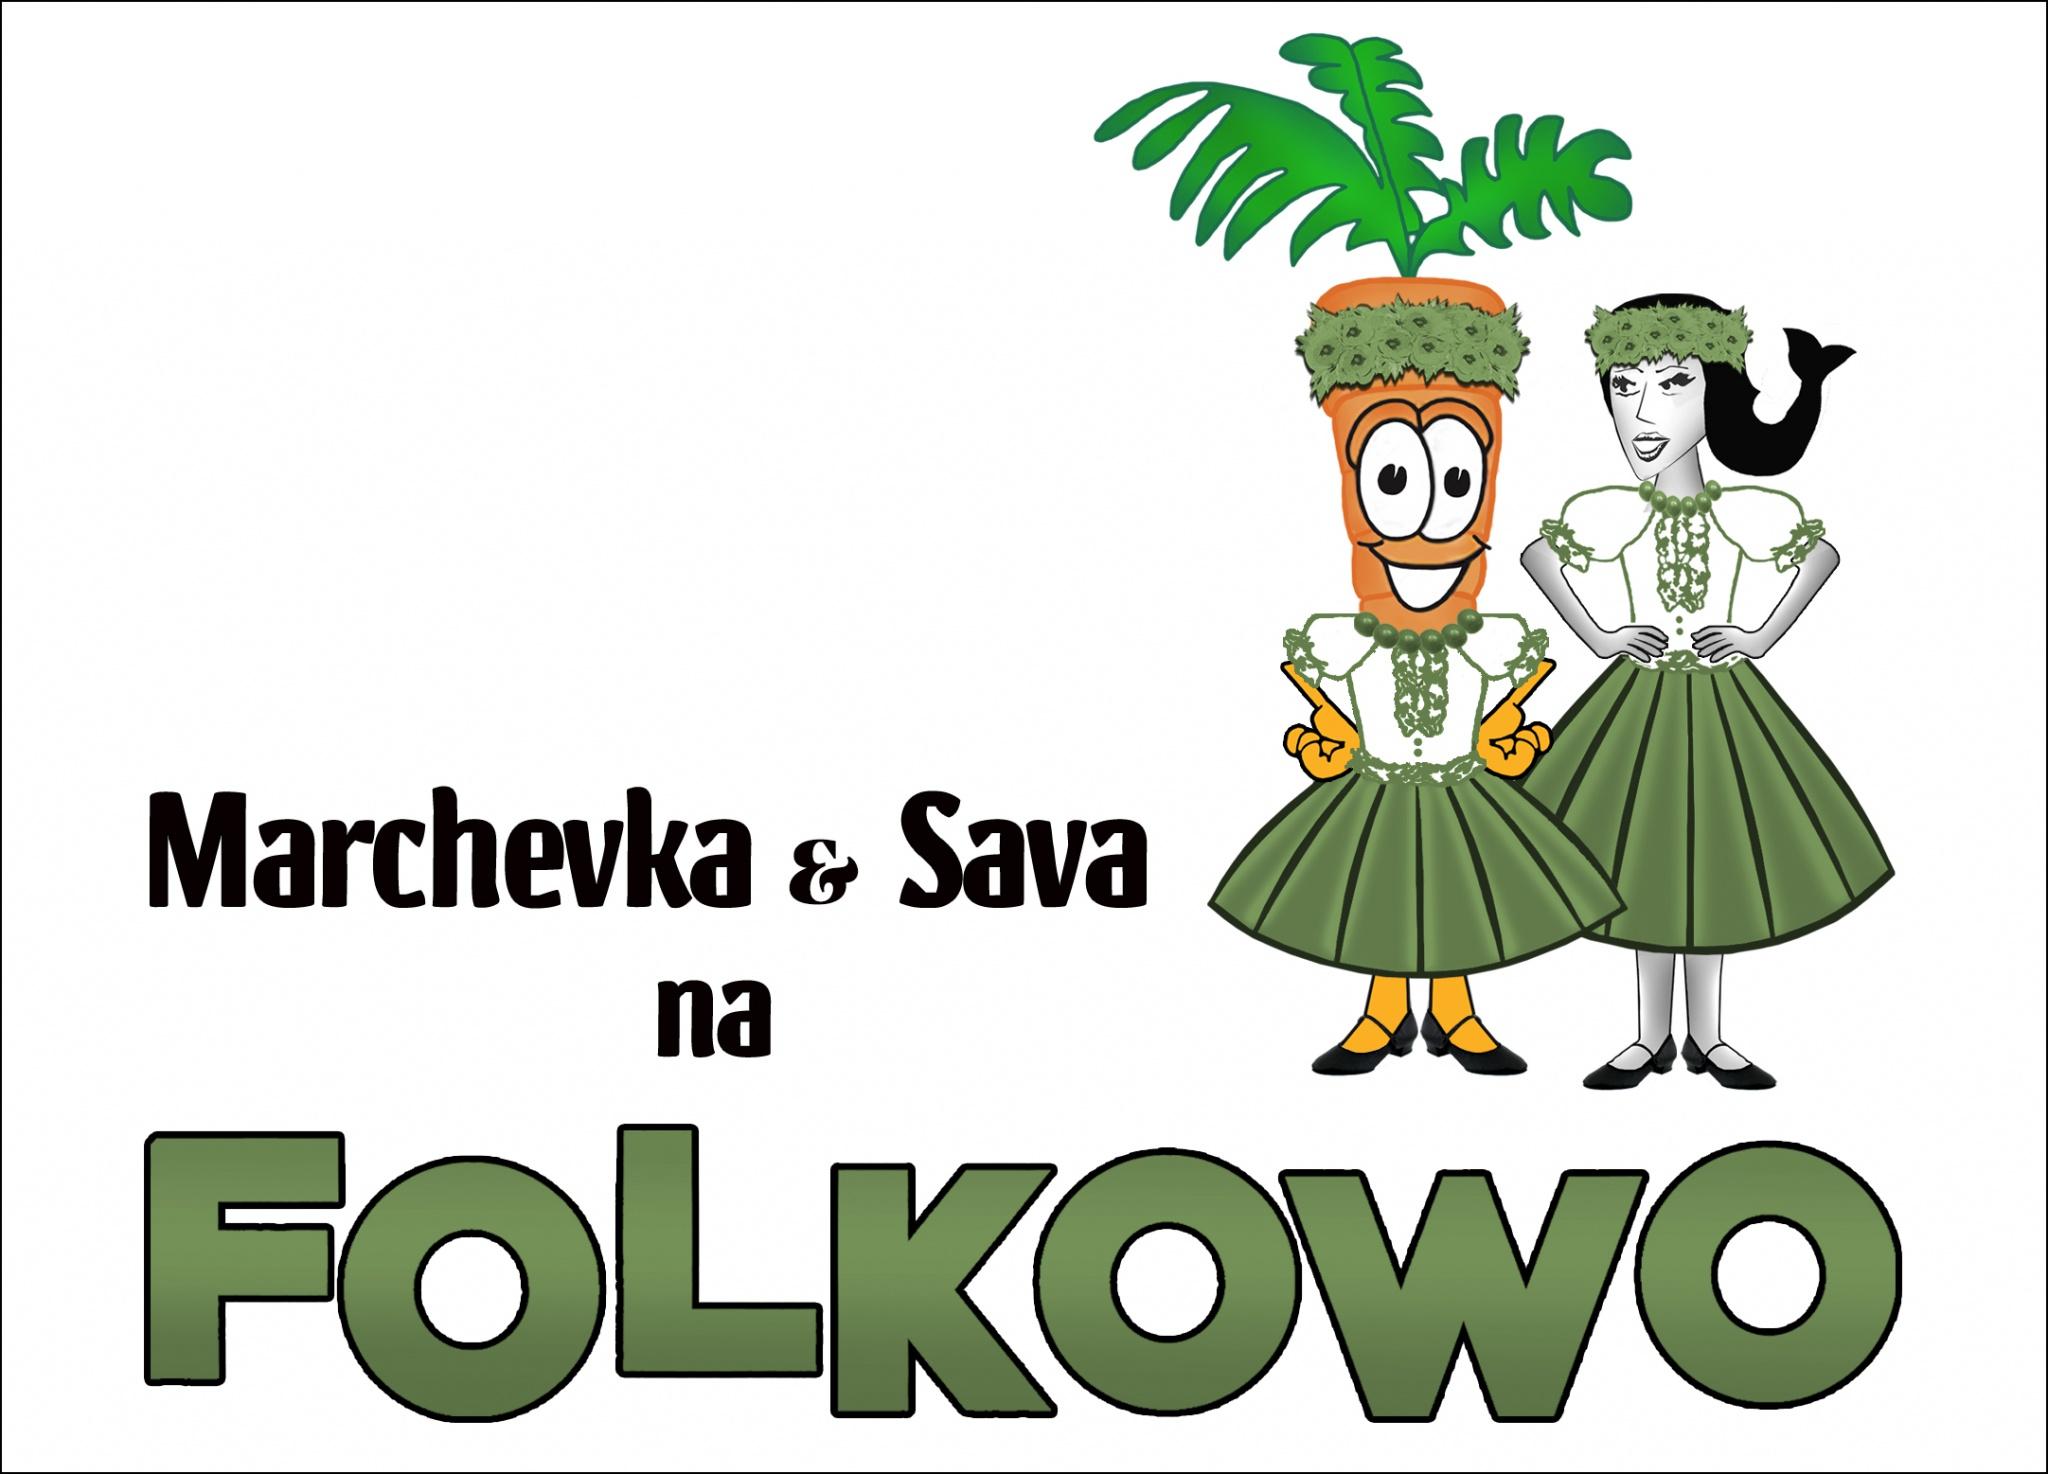 Marchevkowo na folkowo